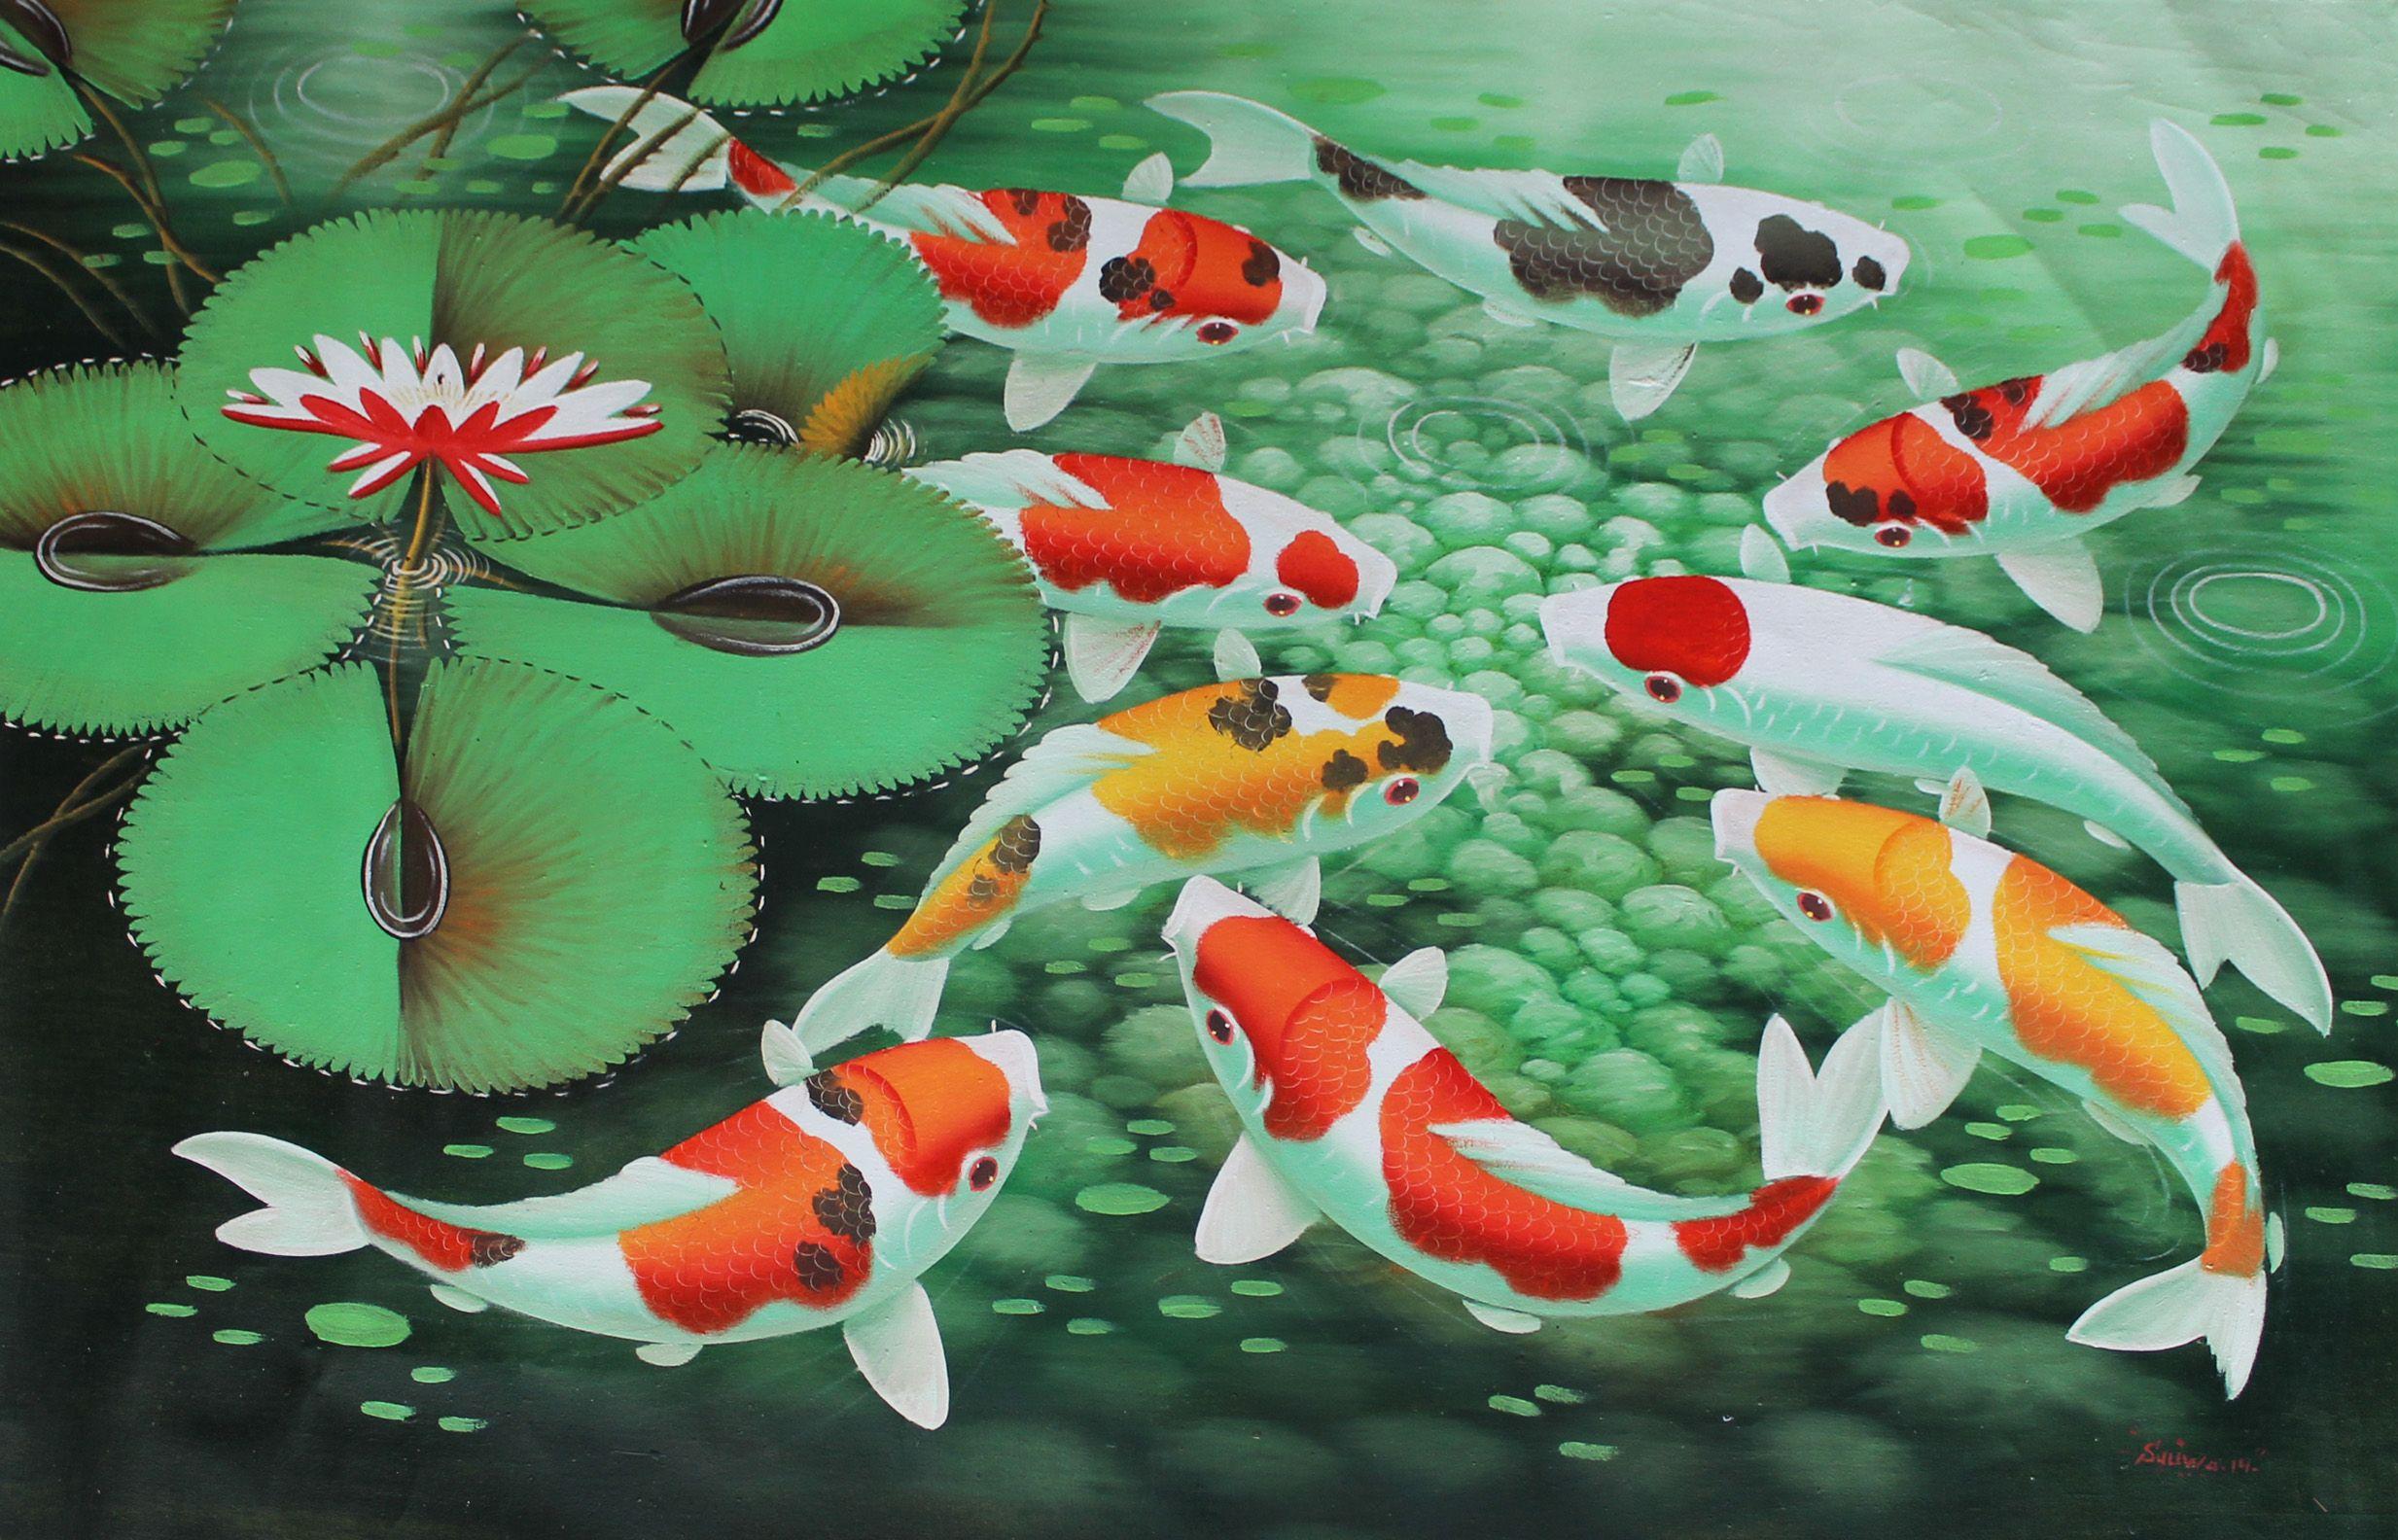 Koi Fish Painting - wallpaper. | creatures | Pinterest | Koi ...